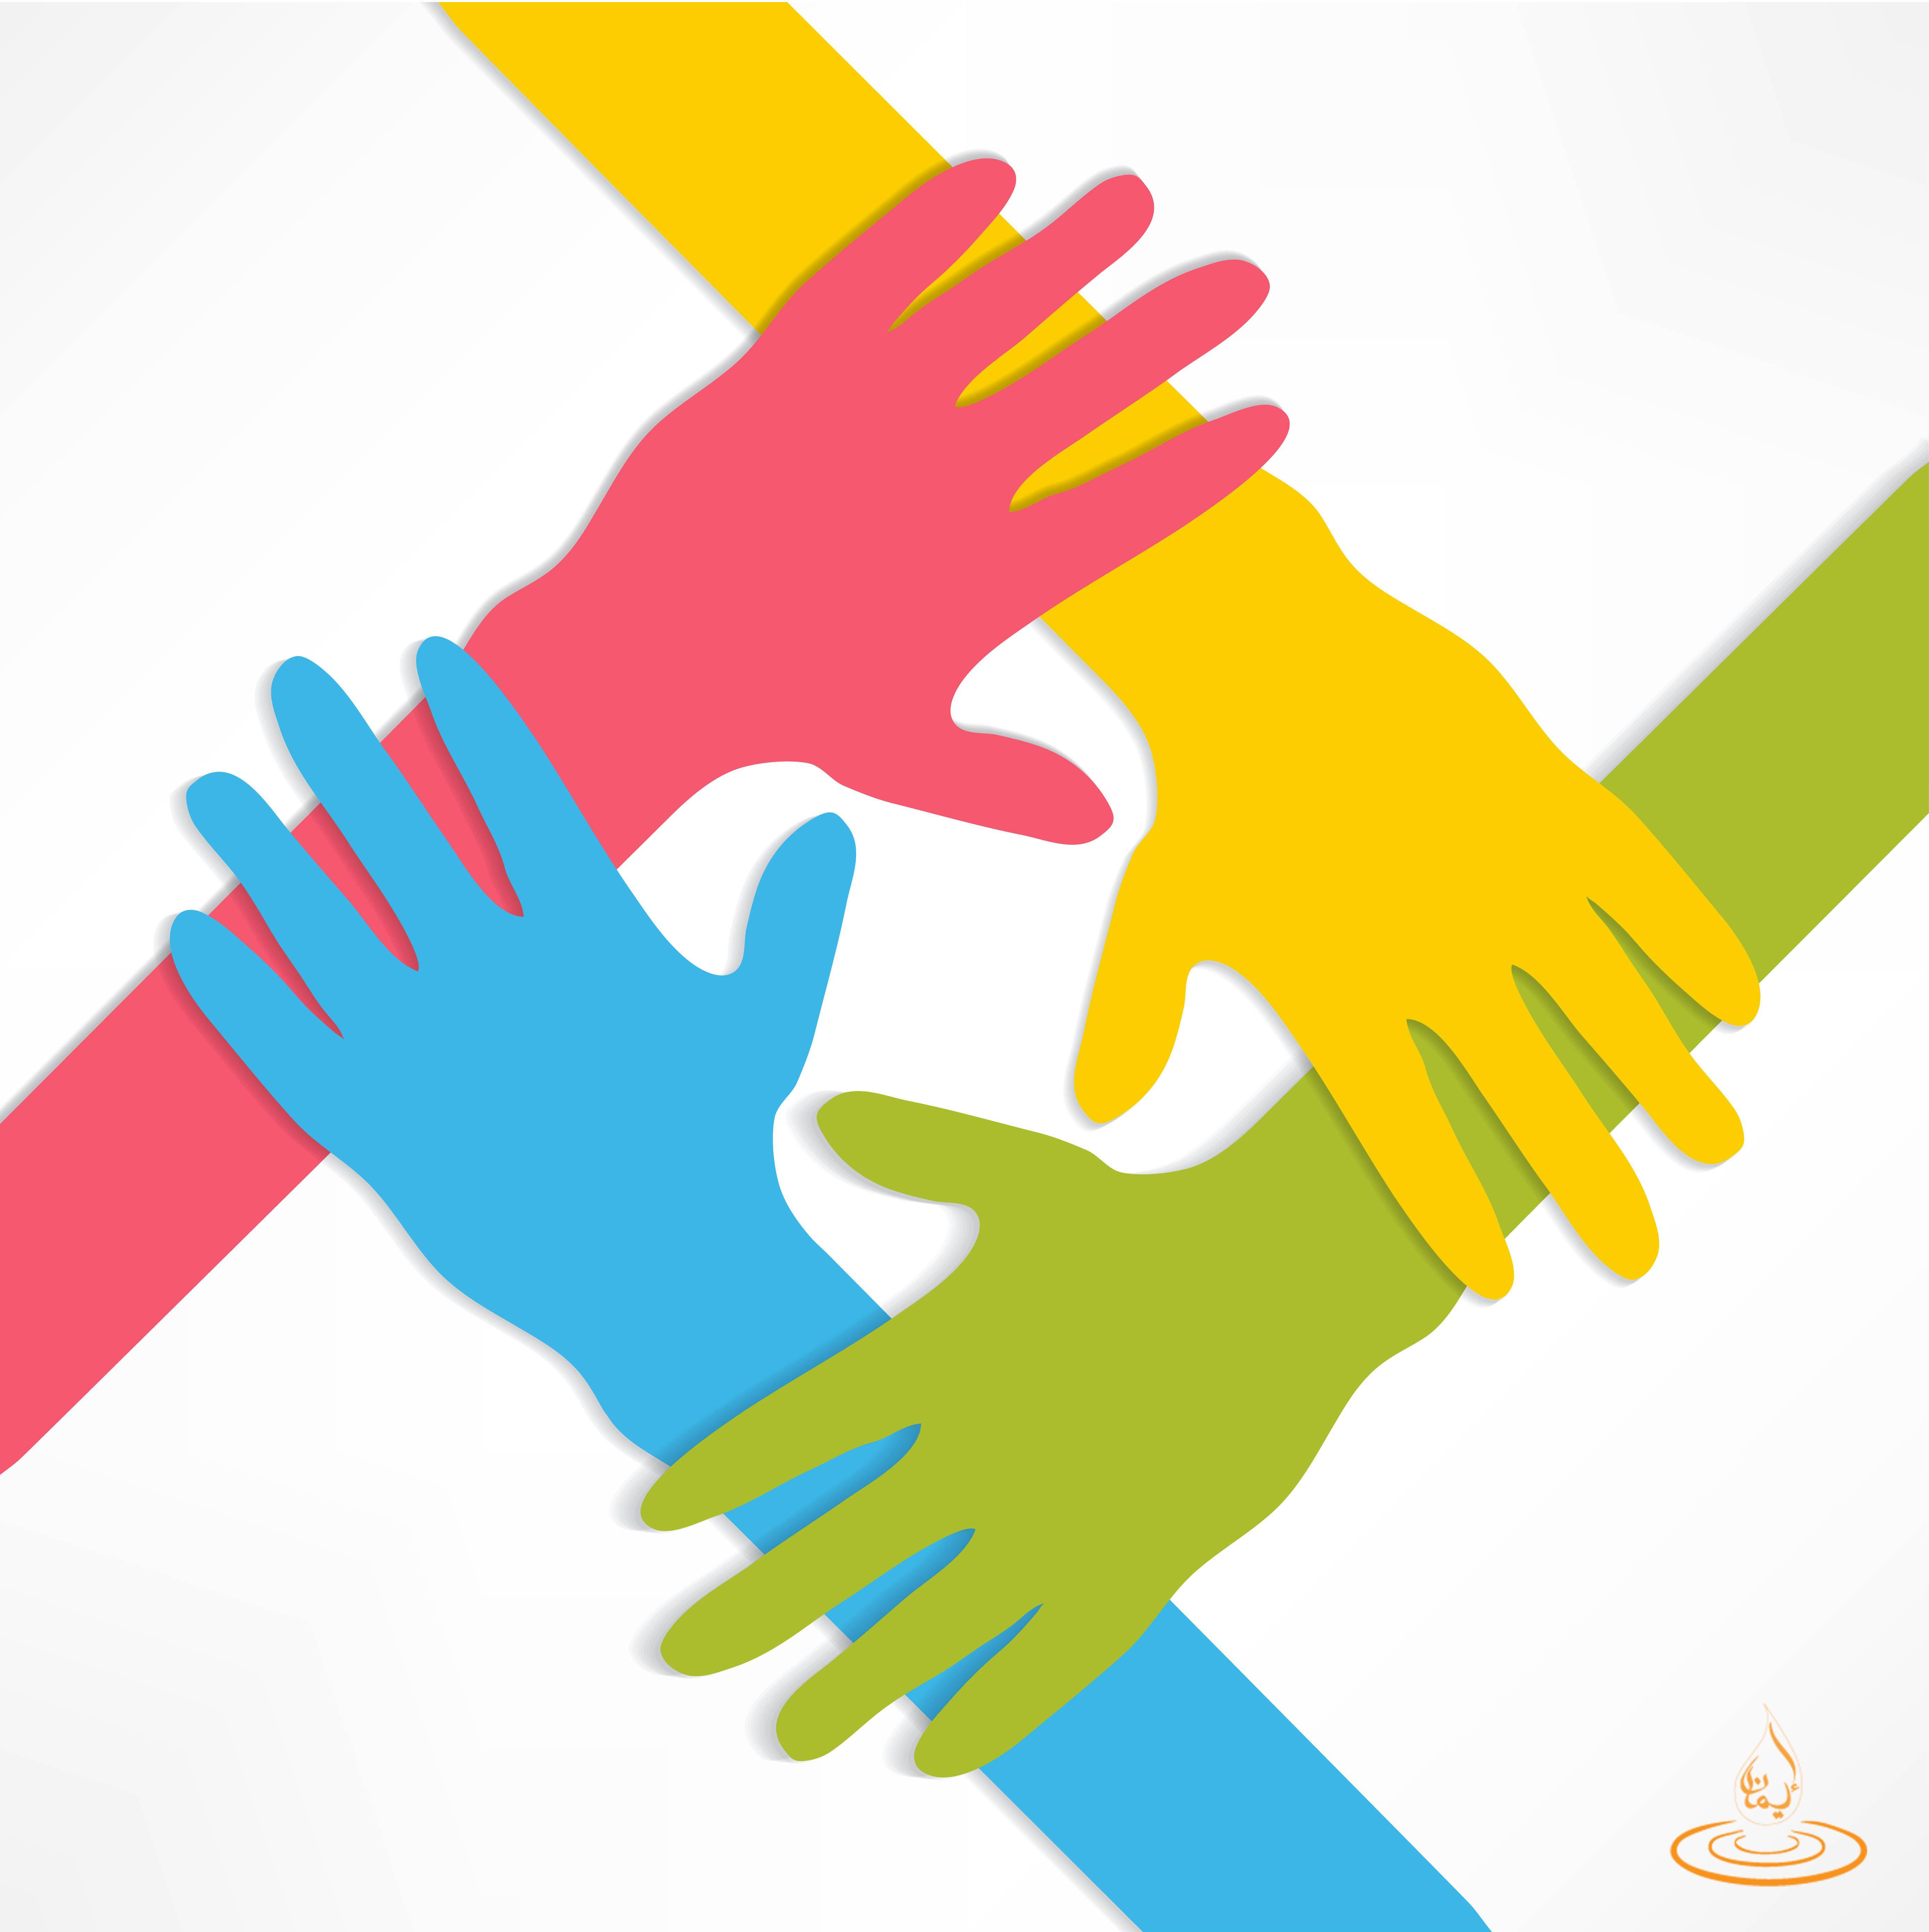 Hand Shaking Logo - ClipArt Best